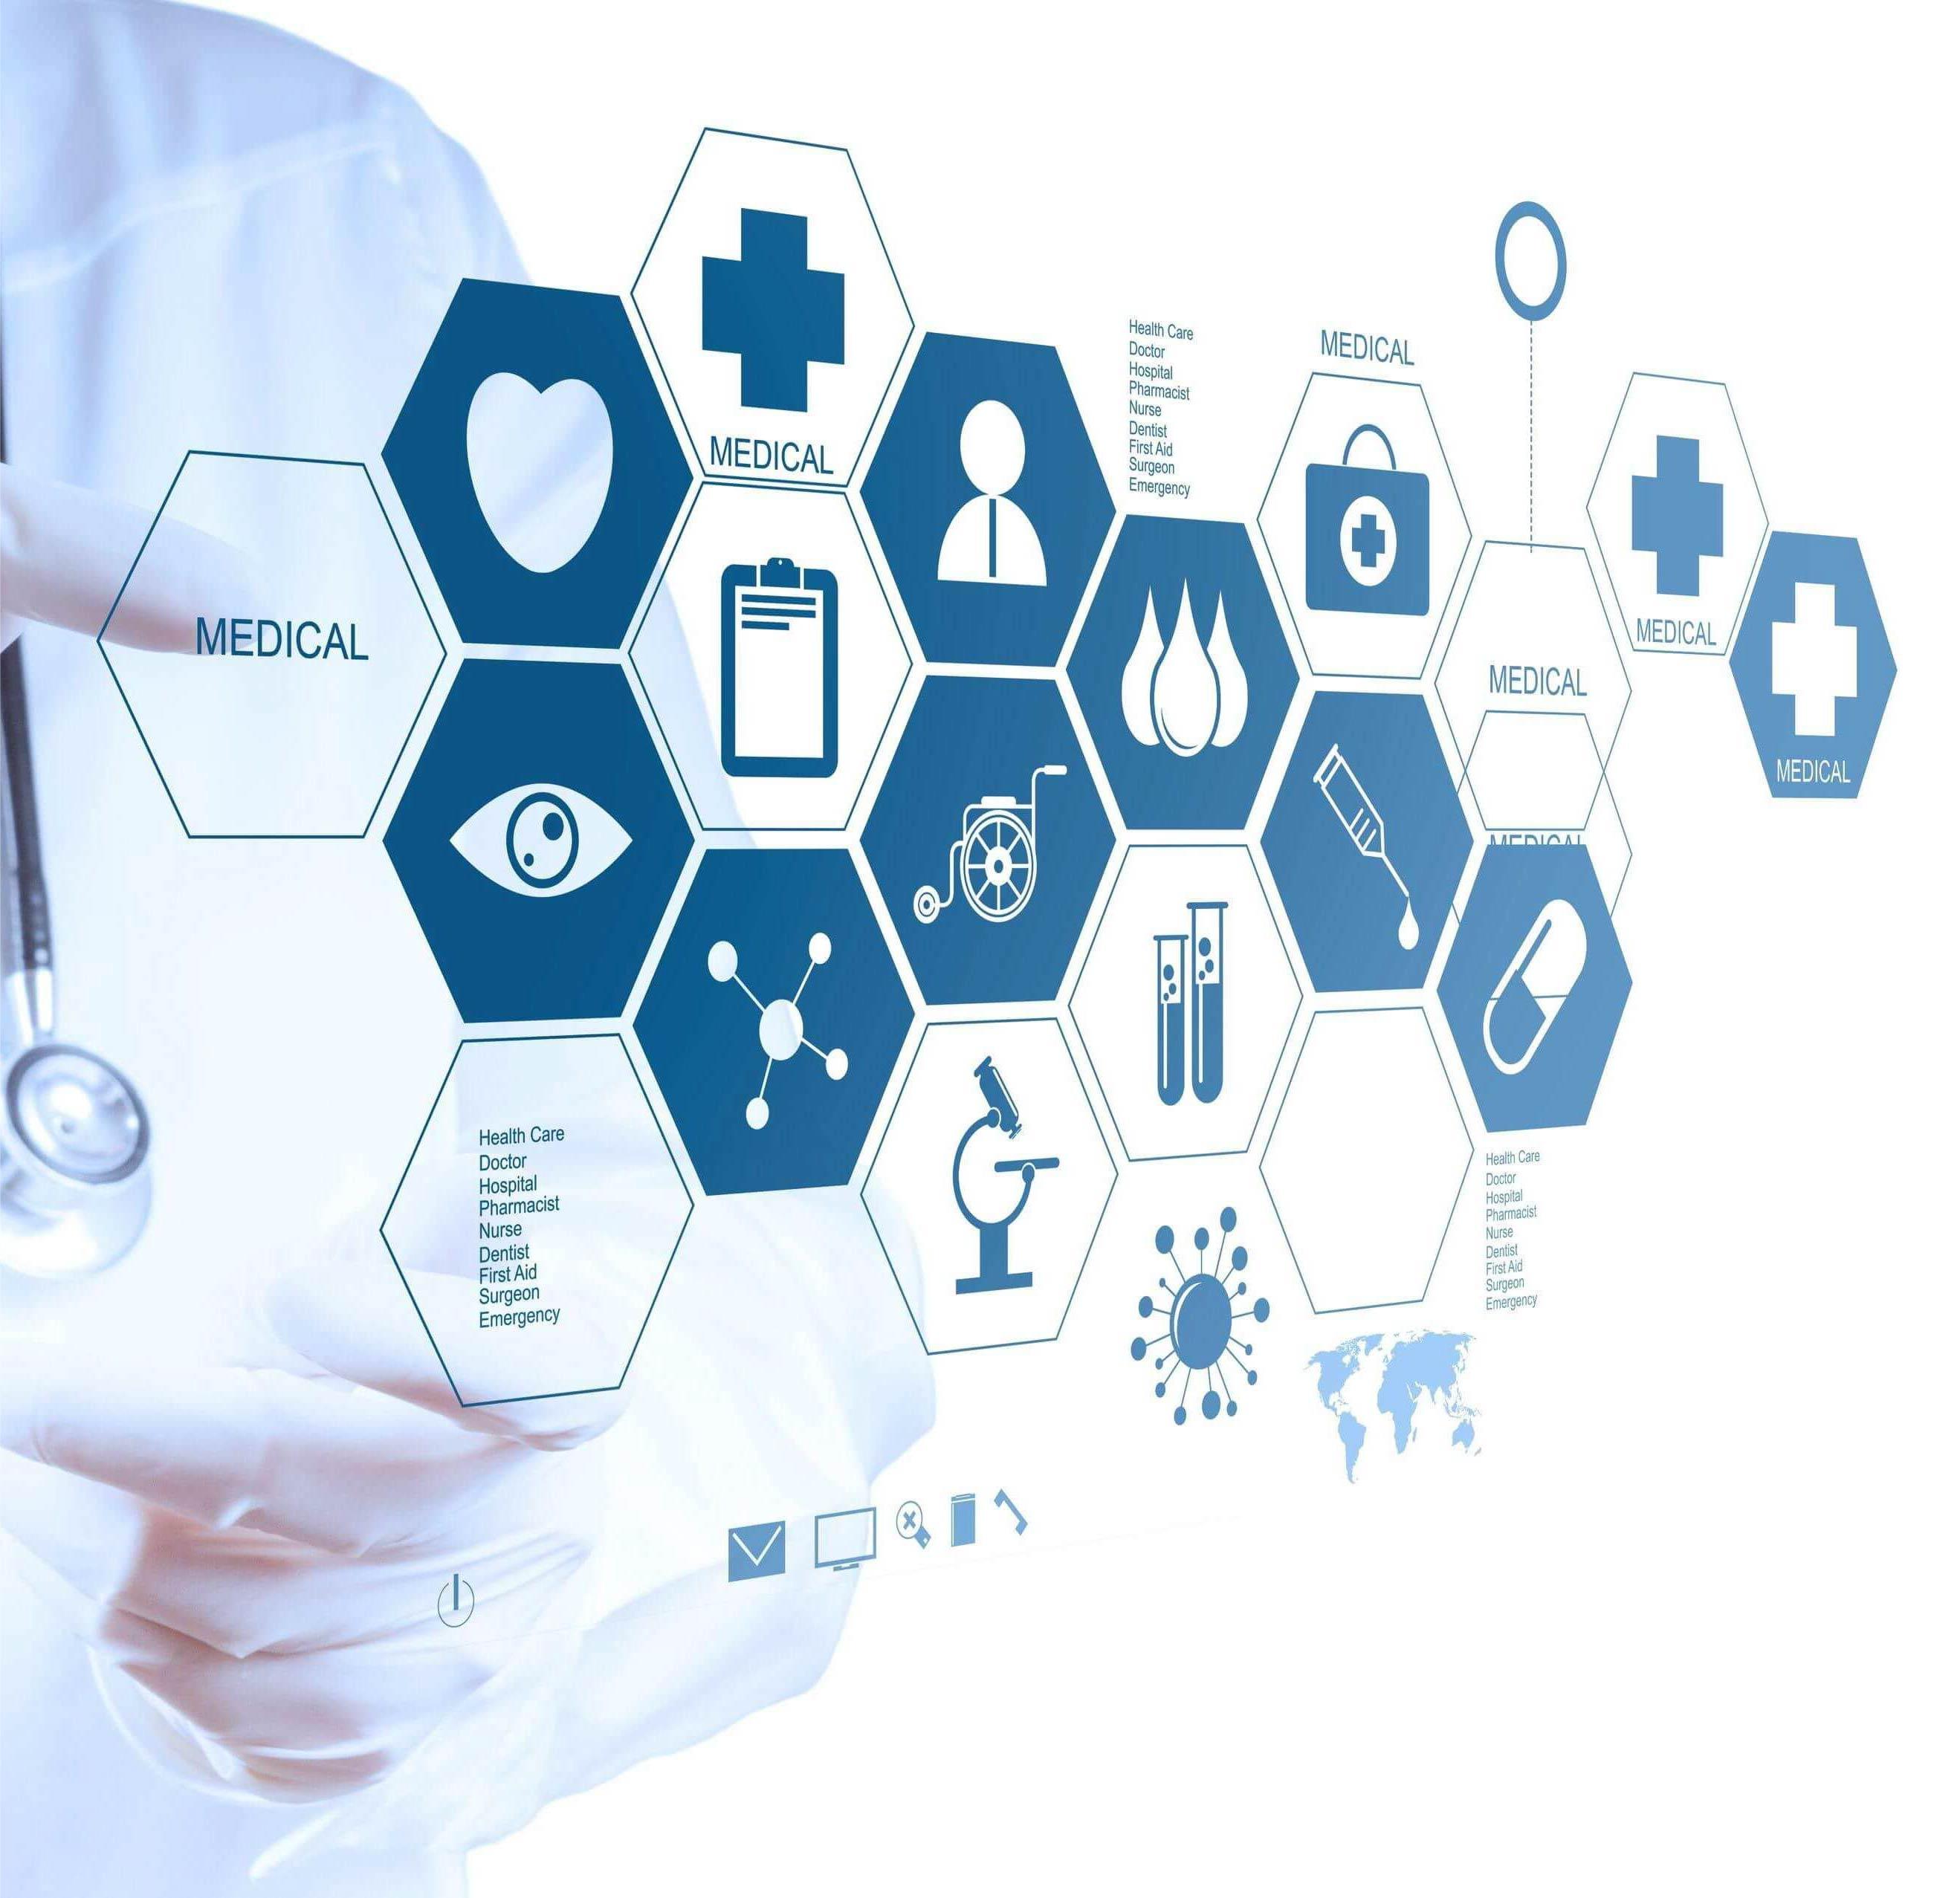 HIPAA Training Requirements